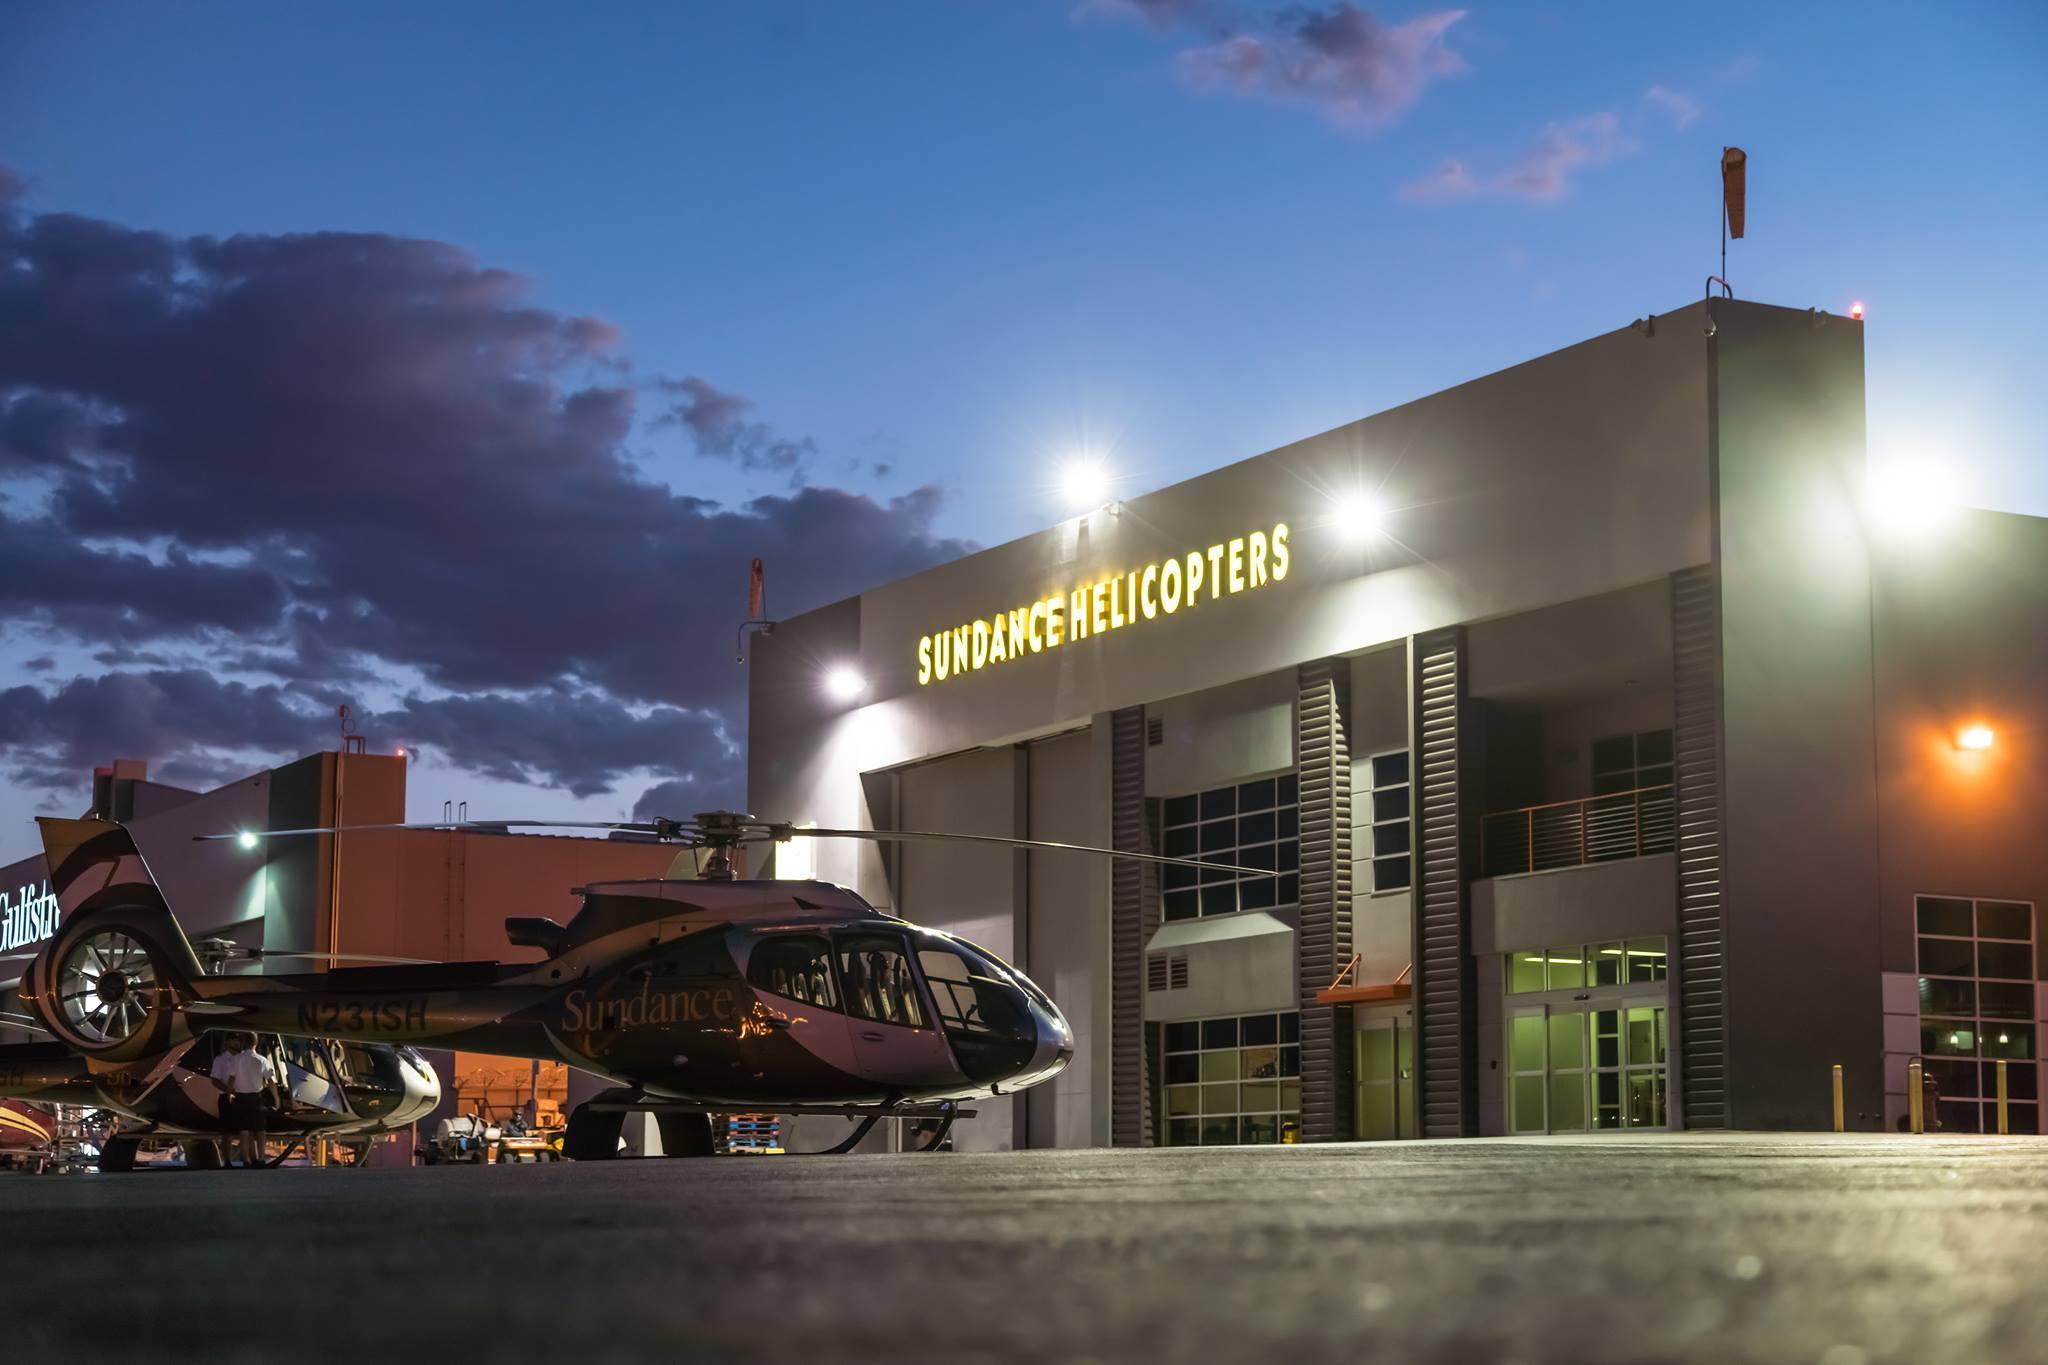 Sundance City Lights — Grand Canyon Tours by GC Tours on sundance helicopter crash las vegas, sunset helicopter tour las vegas, maverick helicopters las vegas,